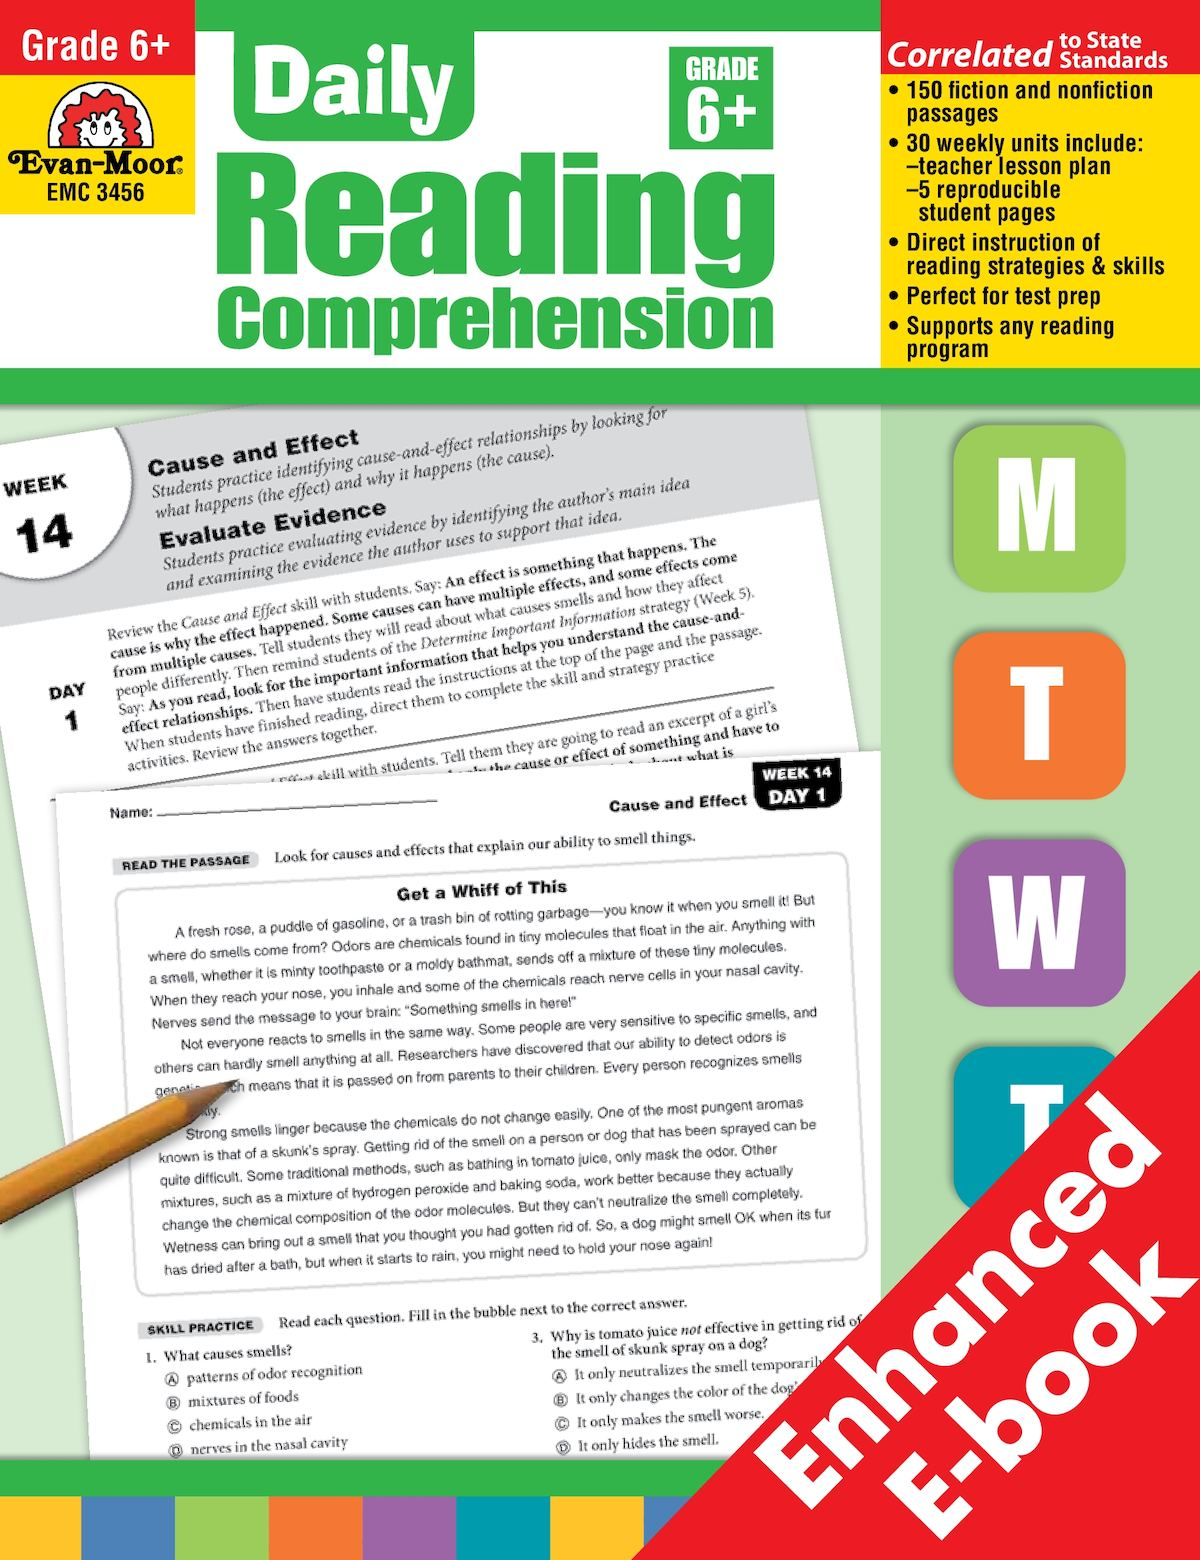 - Calaméo - Daily Reading Comprehension